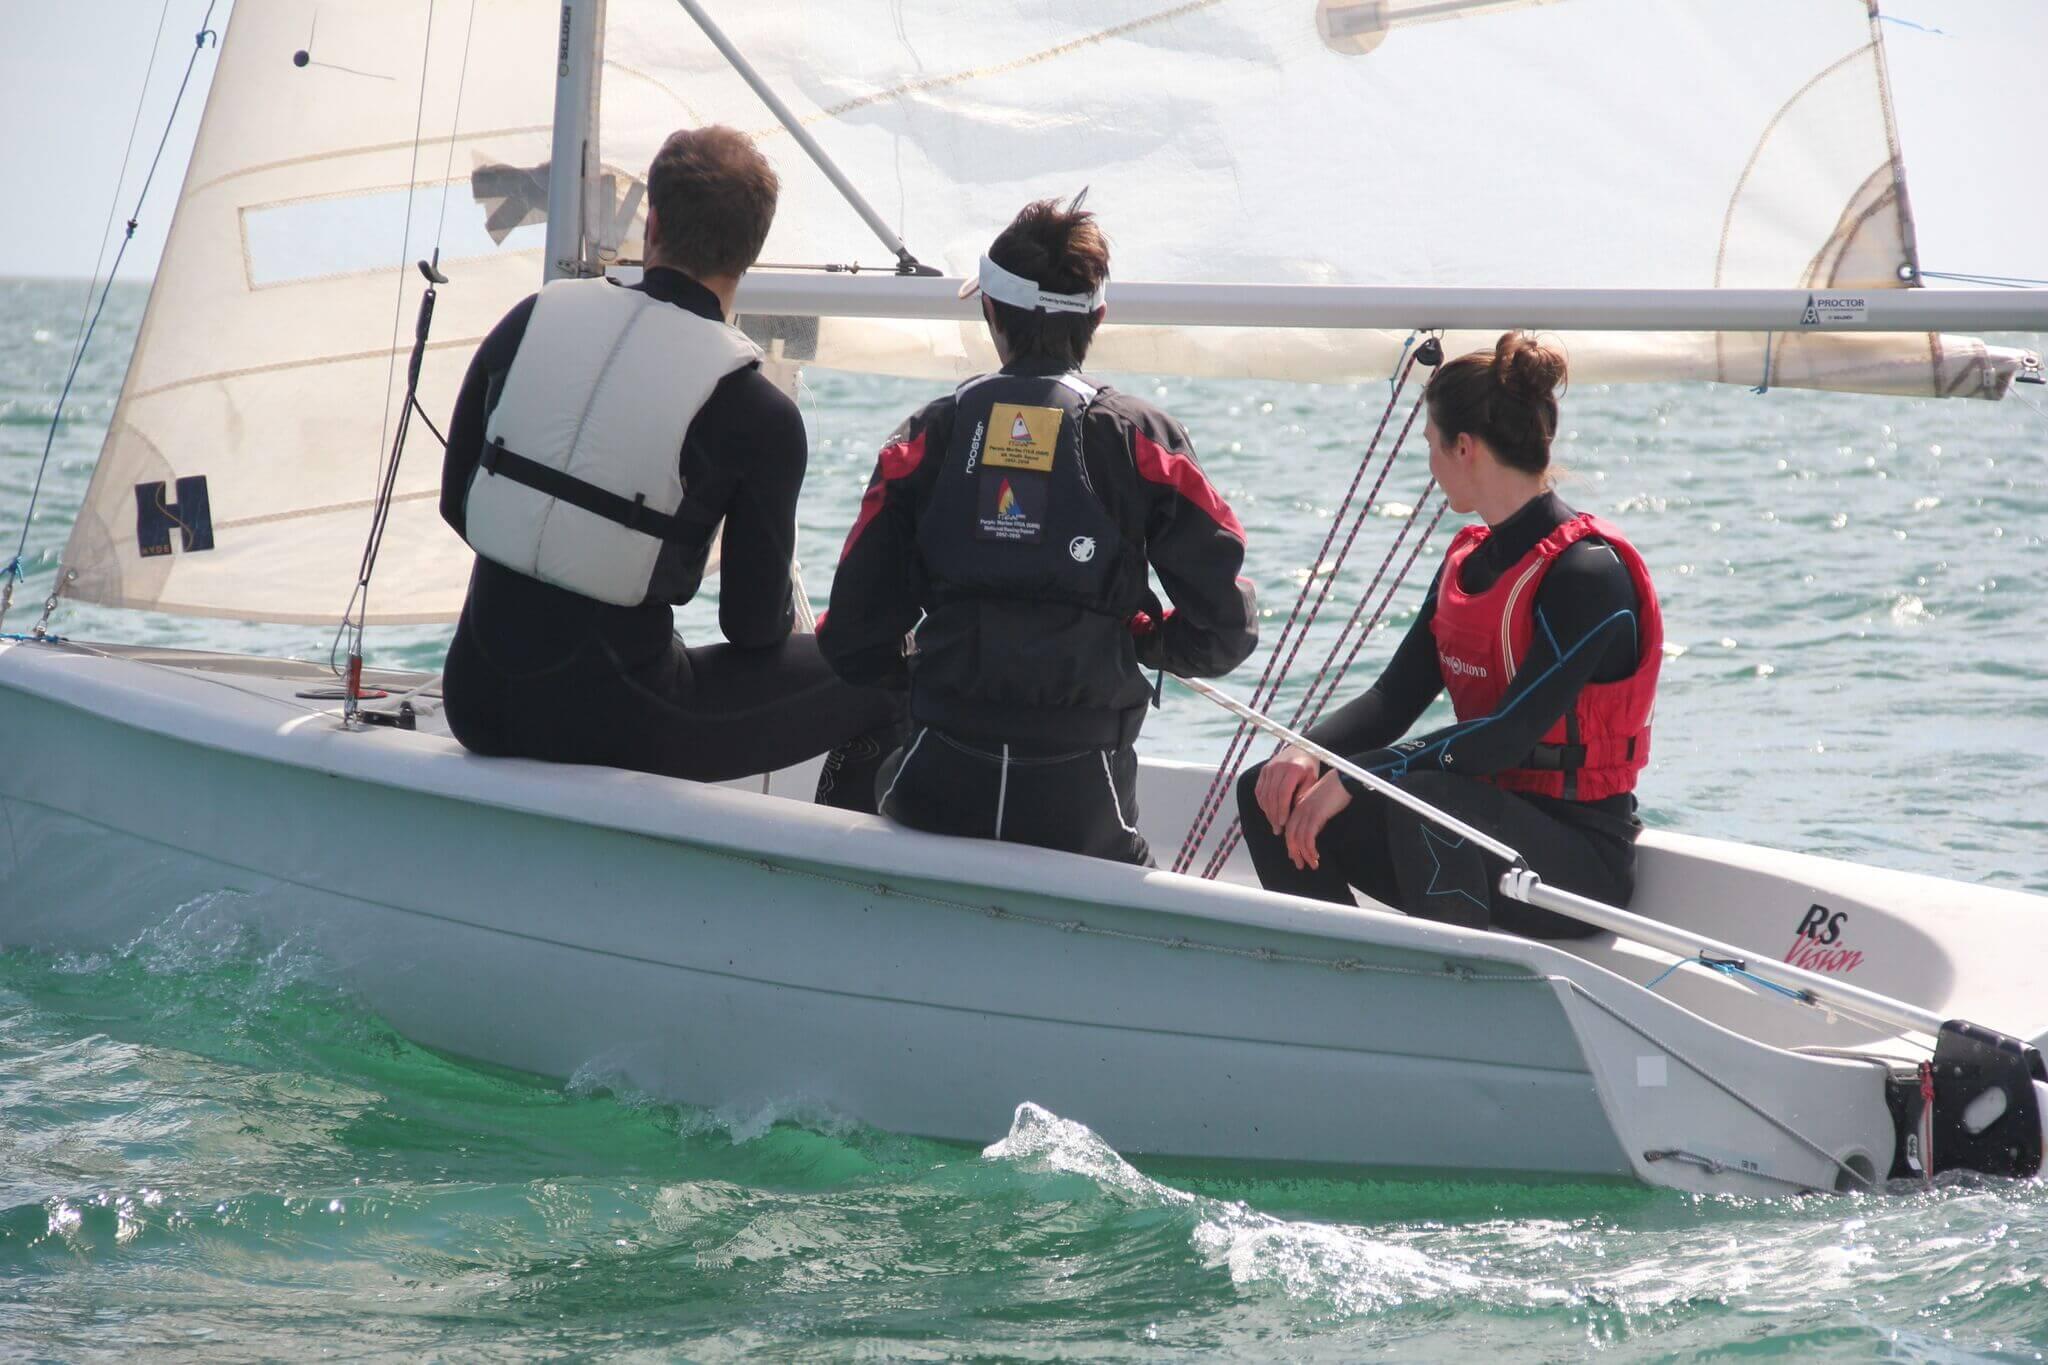 RYA Adult L2 Basic Sailing Skills